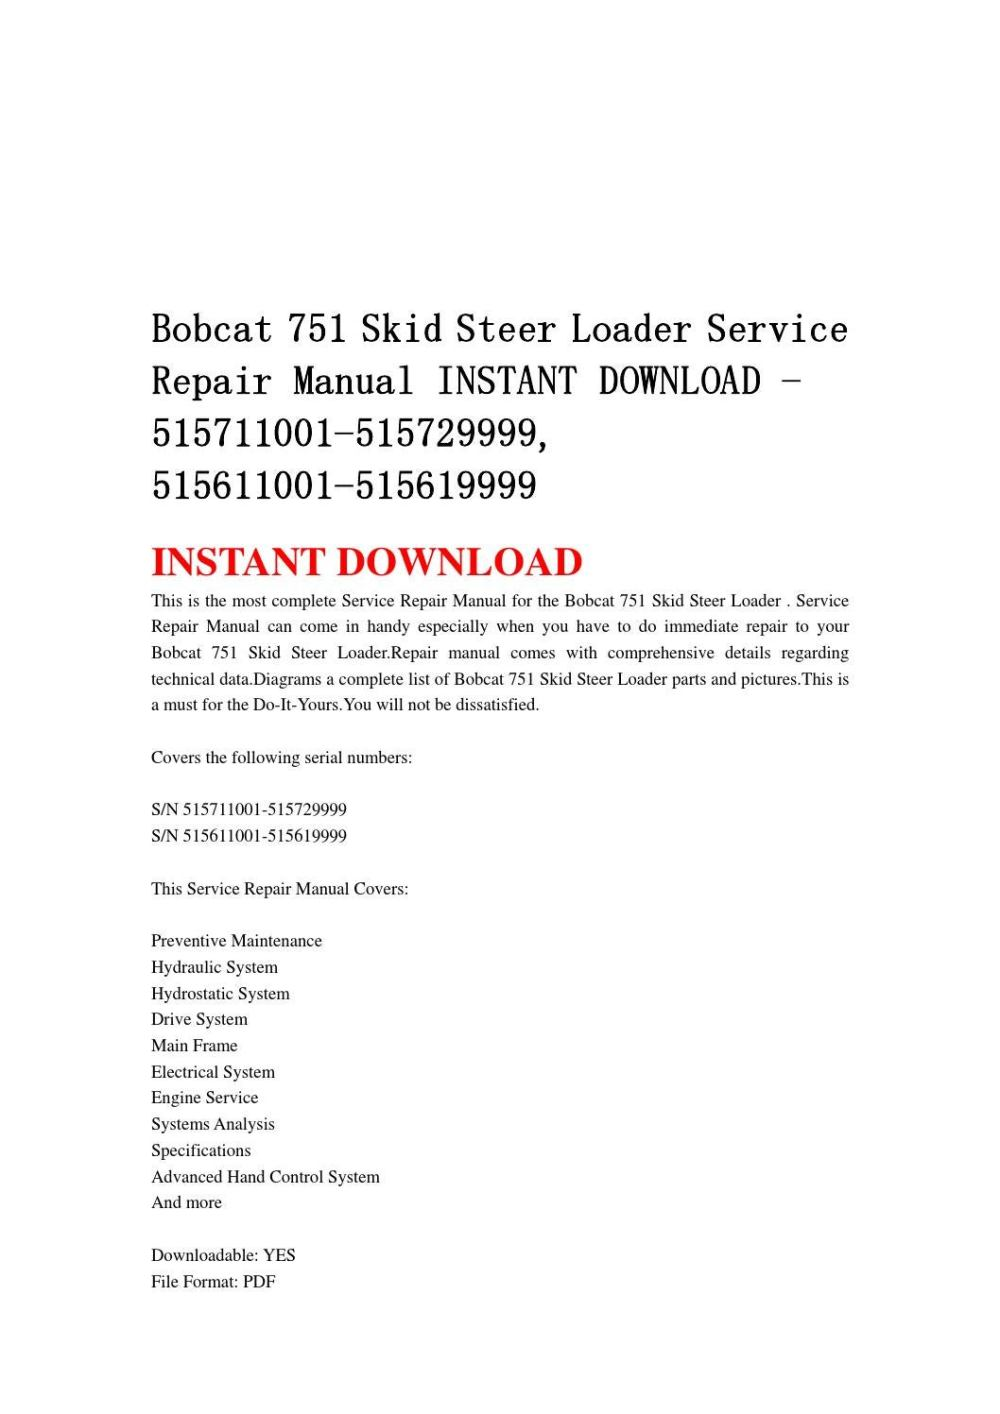 medium resolution of bobcat 751 skid steer loader service repair manual instant download 515711001 515729999 515611001 5